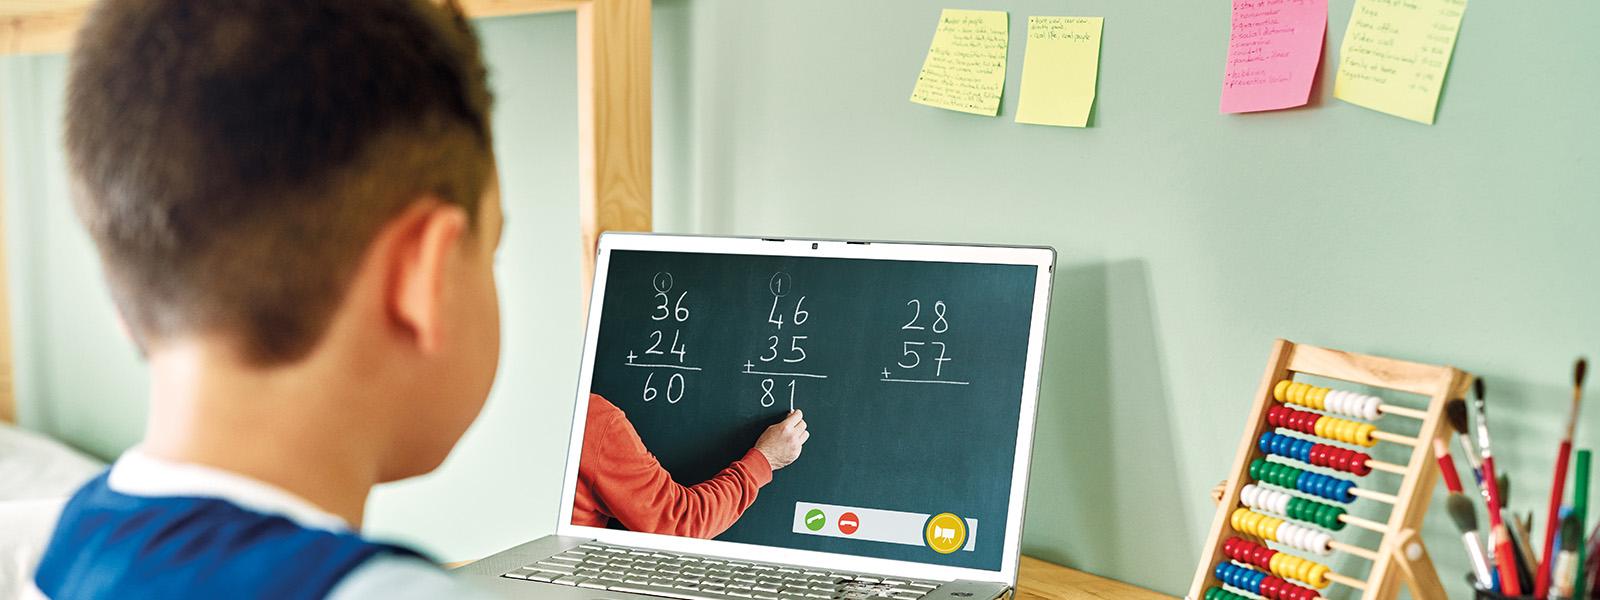 Young boy taking online math class